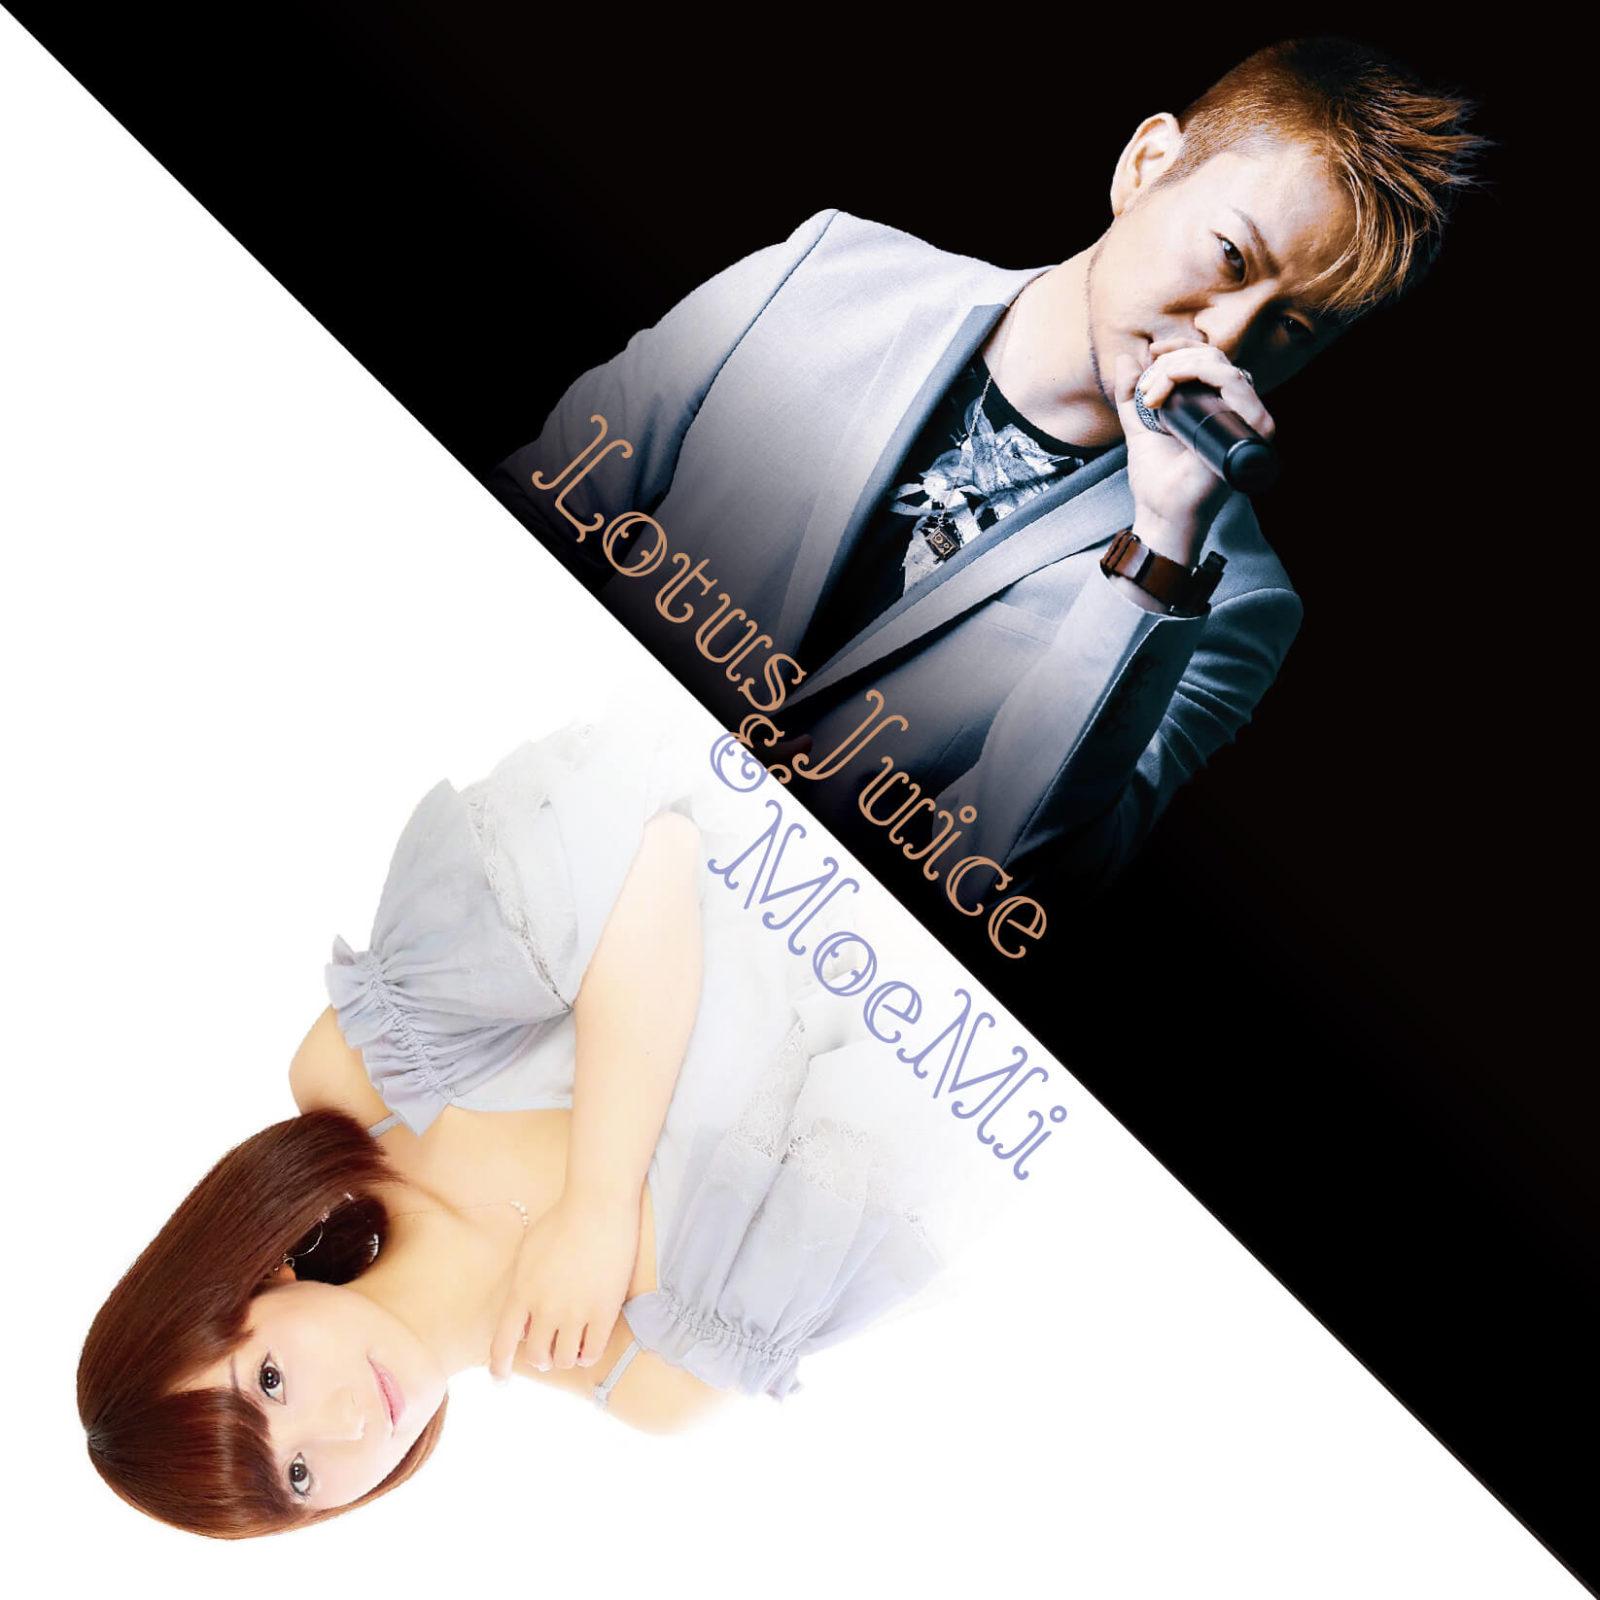 Lotus Juice & MoeMi「Place of My Heart」が、CBCテレビ『メイプル超音楽』の8月エンディング曲に決定サムネイル画像